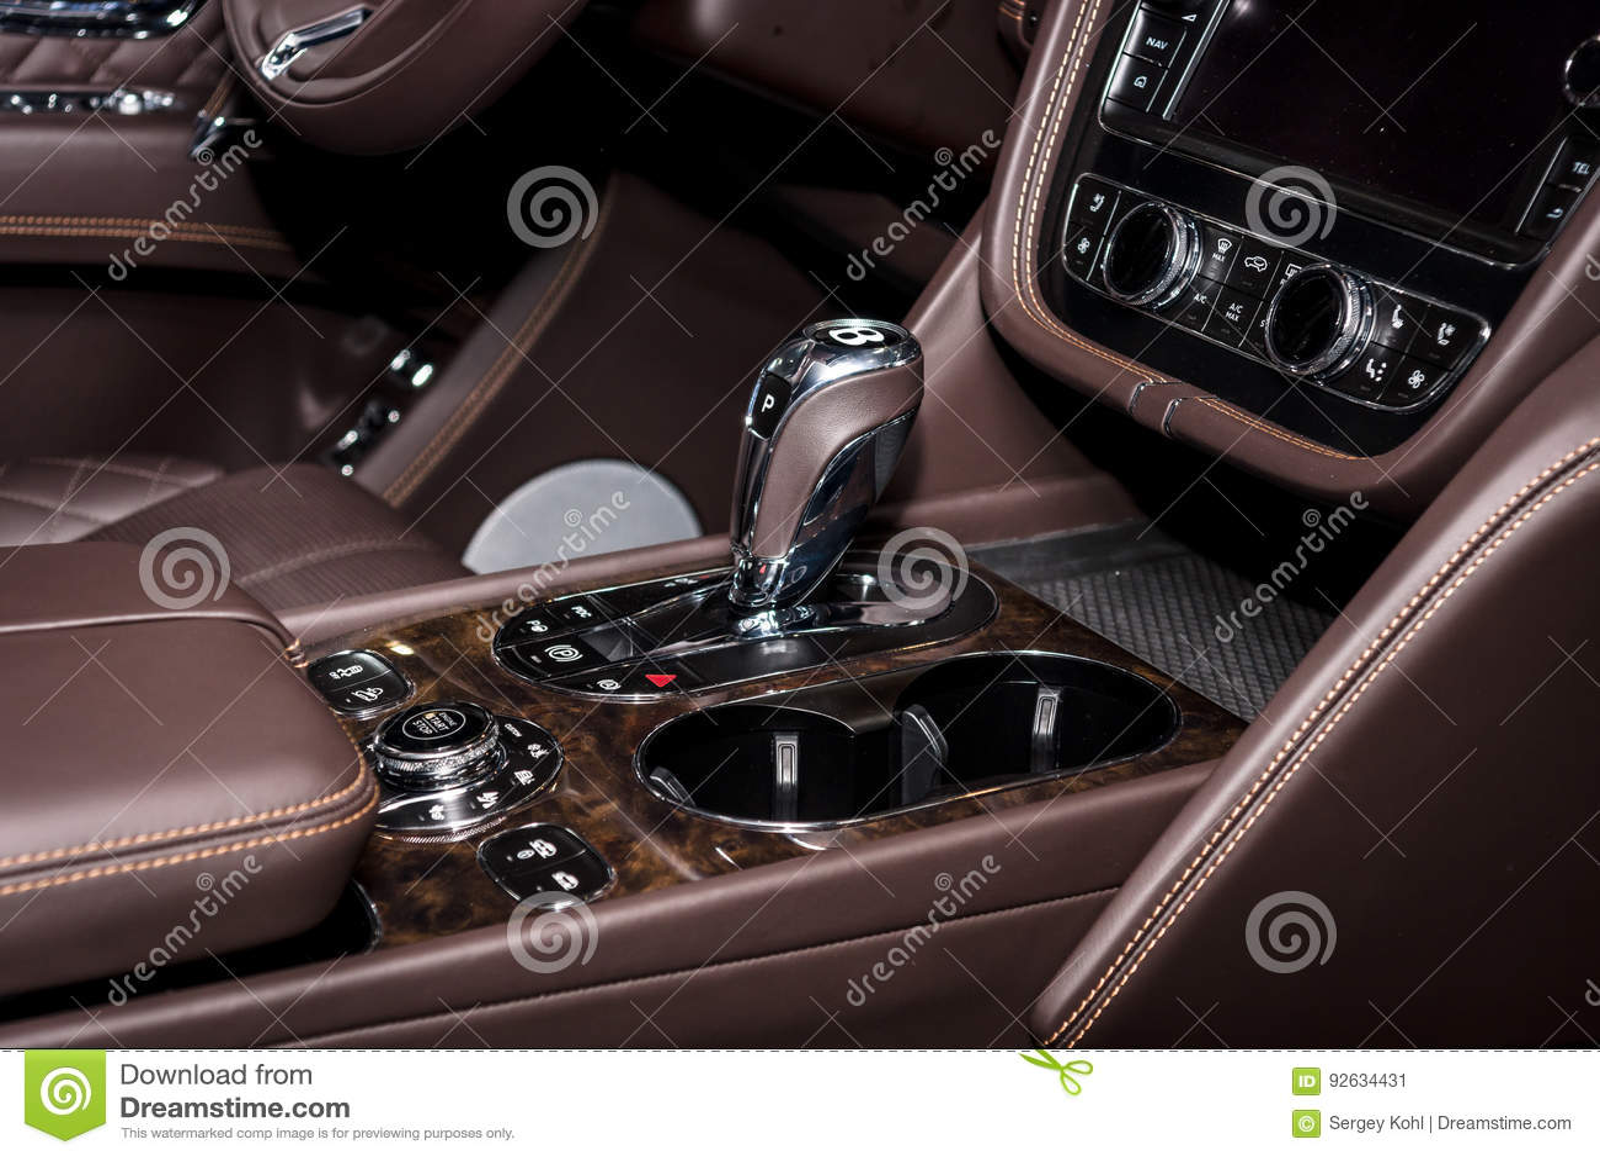 Interior Of The Large Luxury Crossover Suv Bentley Bentayga 2016 Editorial Photo Image Of Bentley Europe 92634431